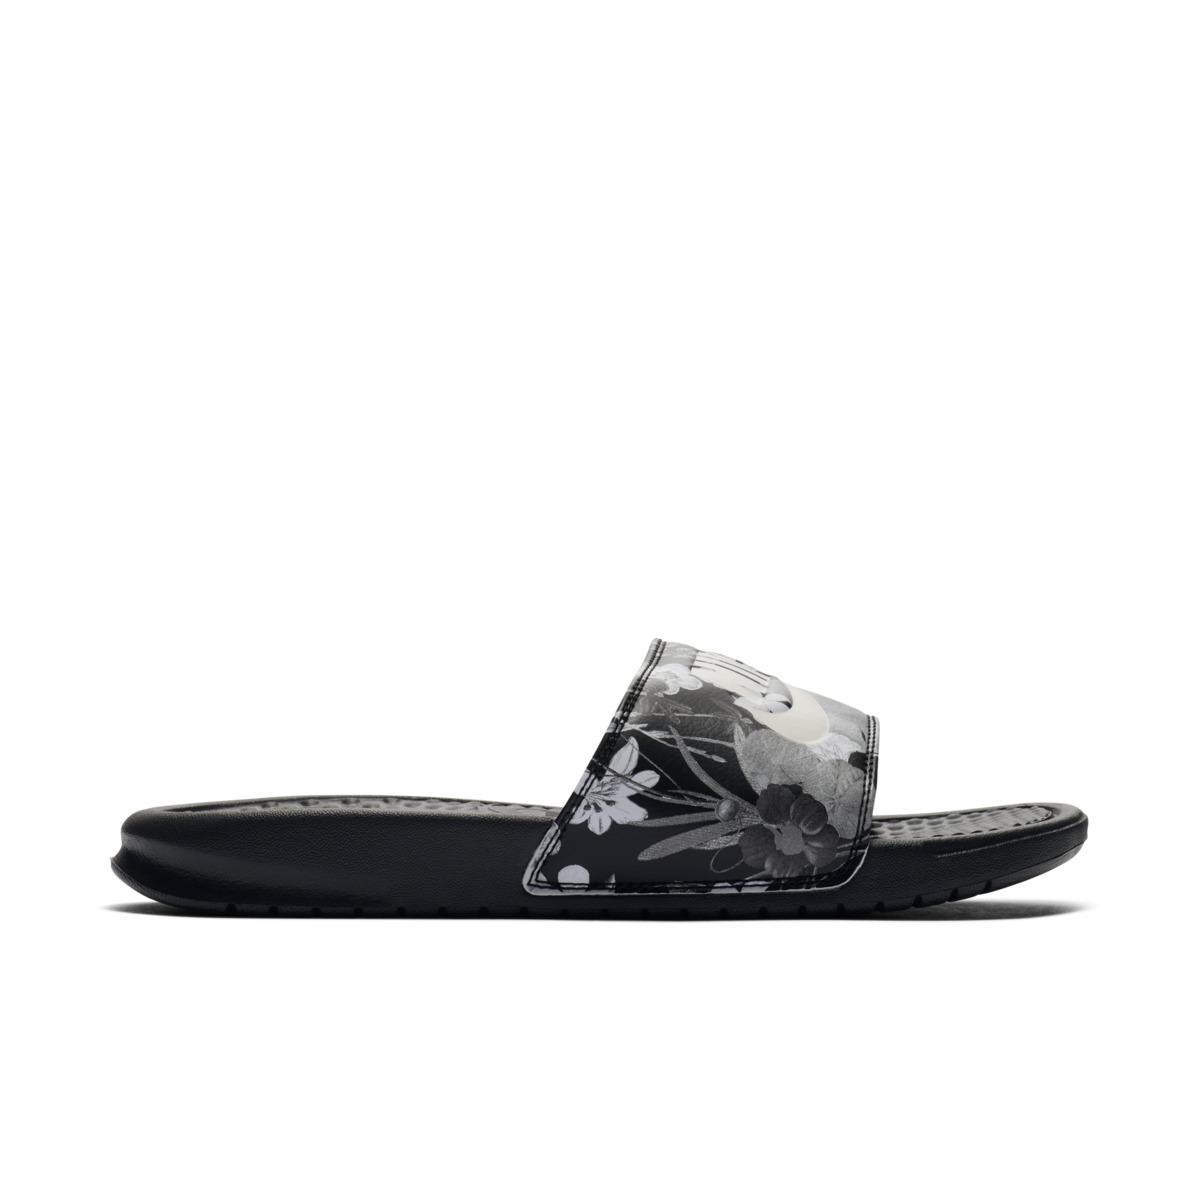 0bad8731b69e Benassi Just It Sandals Black In Nike Lyst Pool Do HwZn16